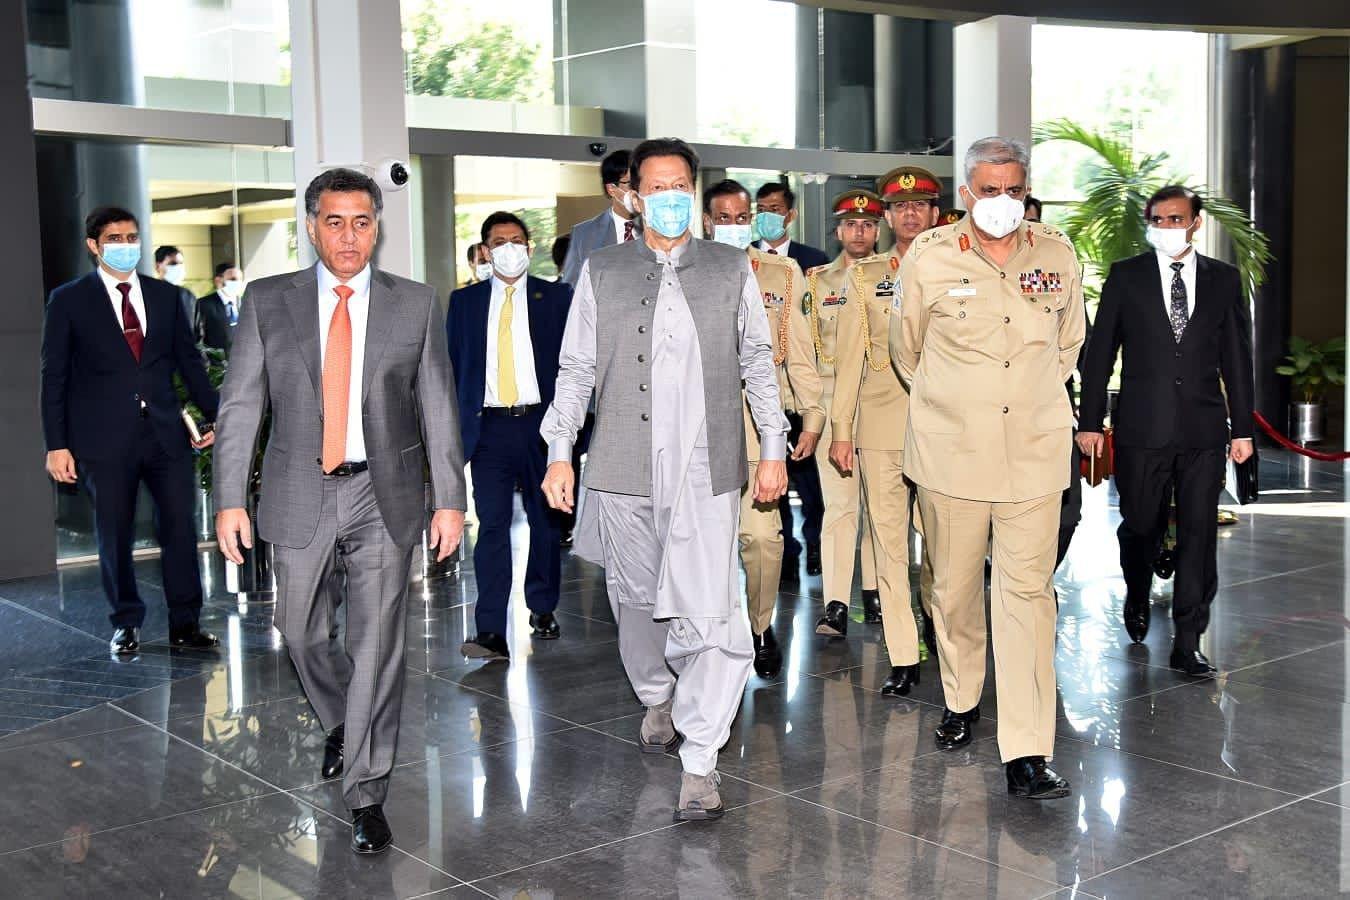 ISI briefs civil-military leaders on Afghanistan